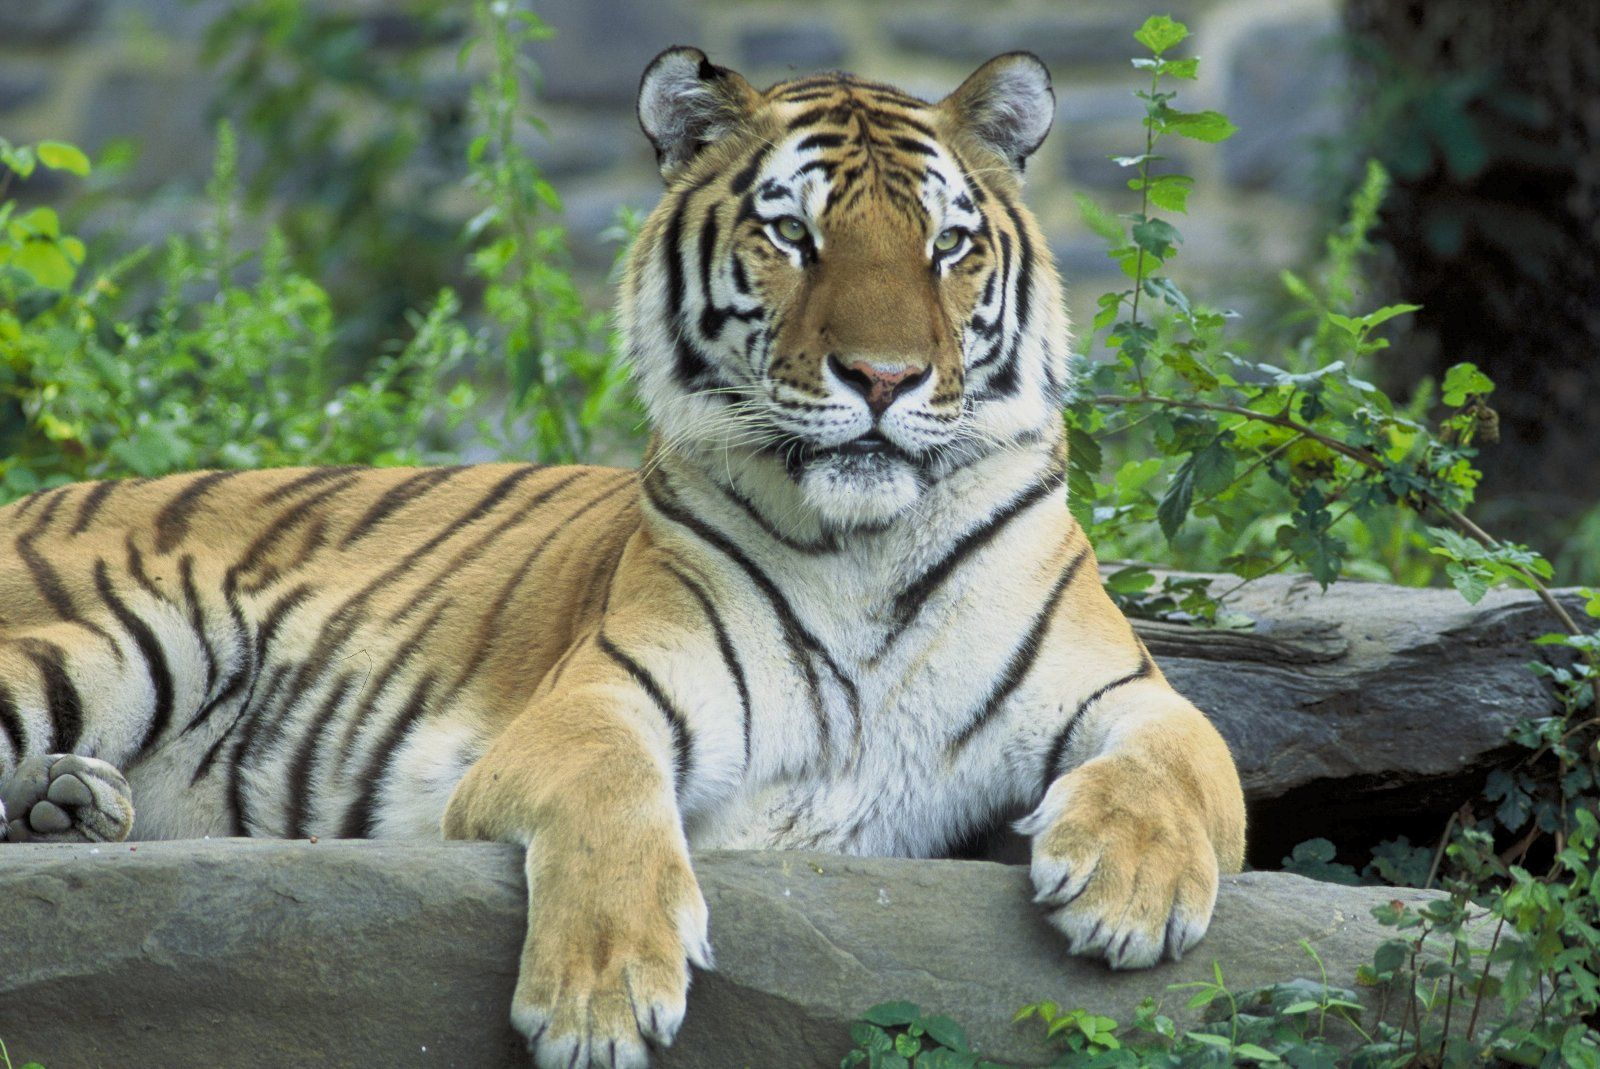 Cool Tiger Wallpaper Desktop Background Wallpapers HD